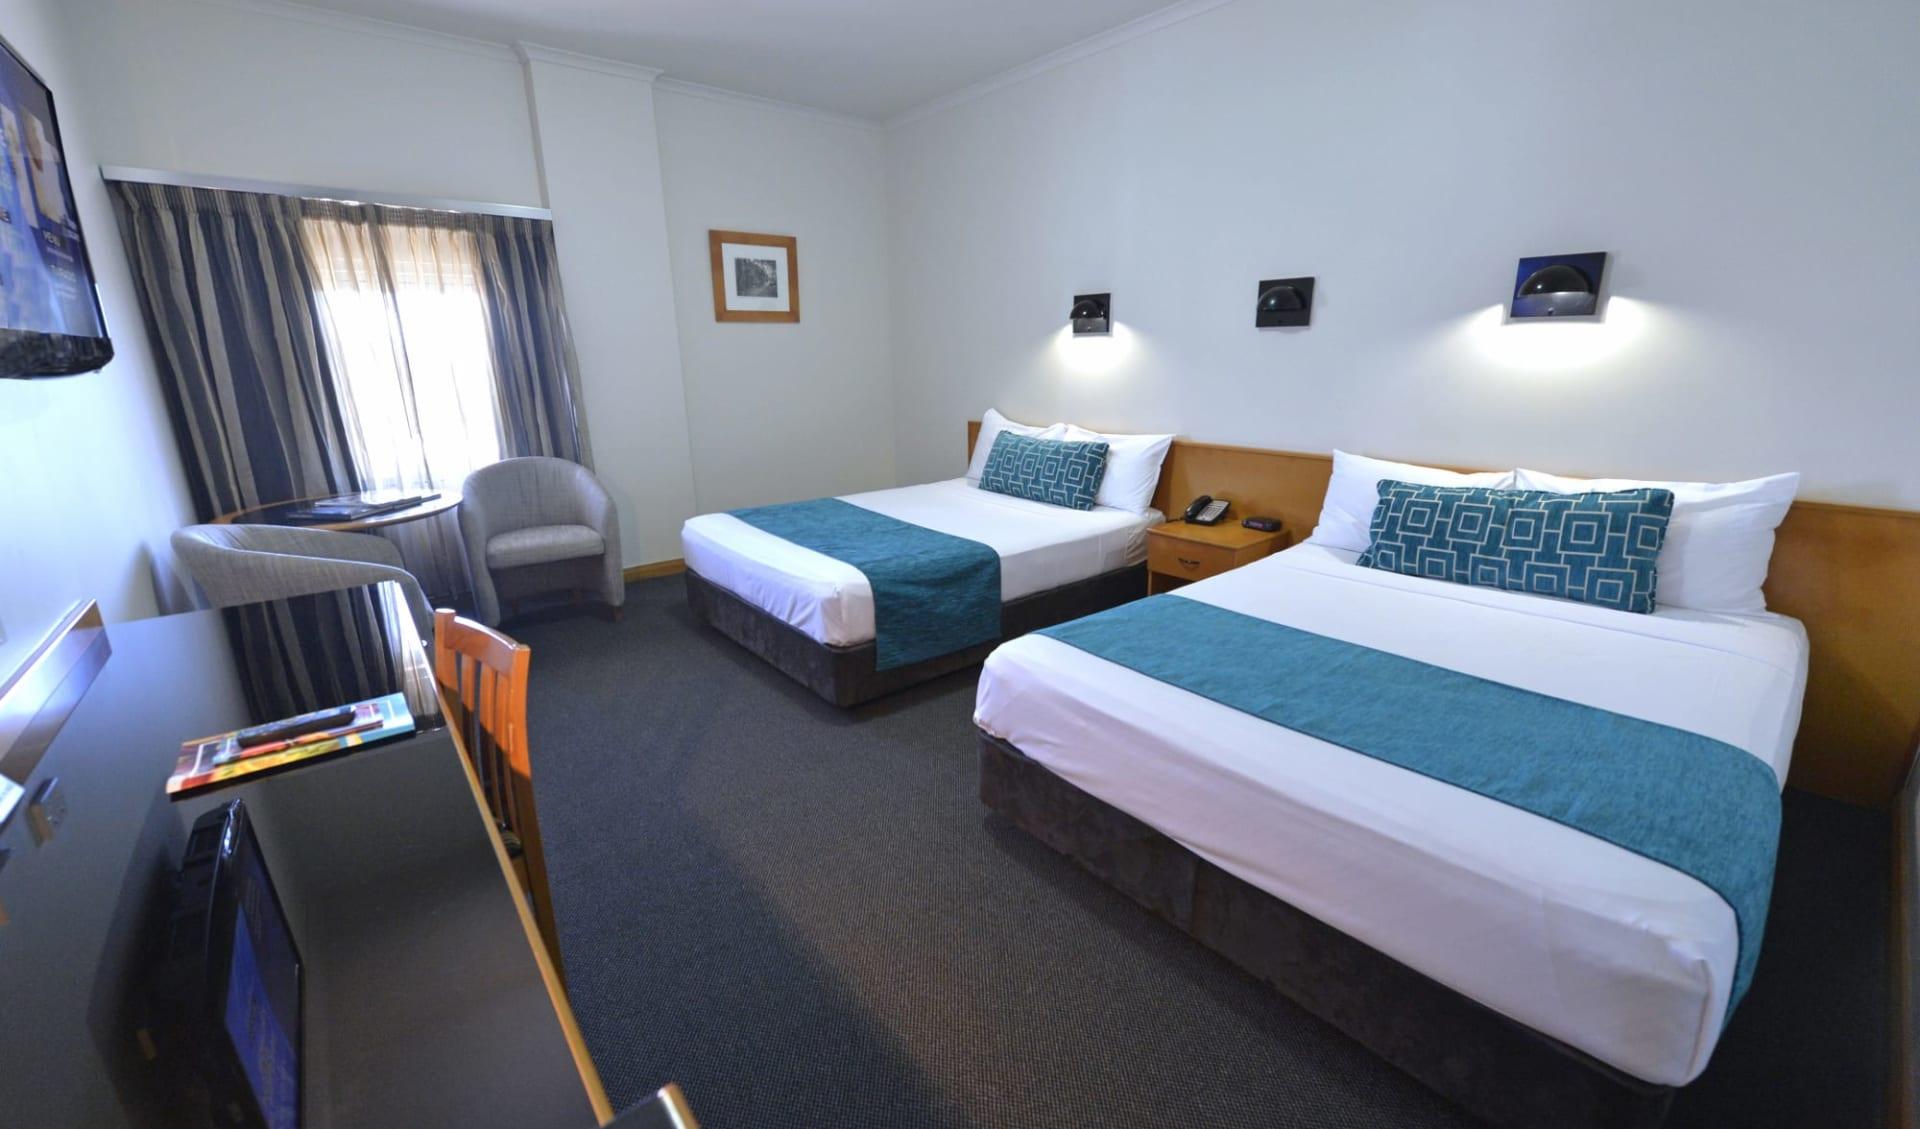 Rydges Darwin Central:  Zimmer Rydges Darwin Central Hotel Darwin Northern Territory Australien  Twin Queen  2018